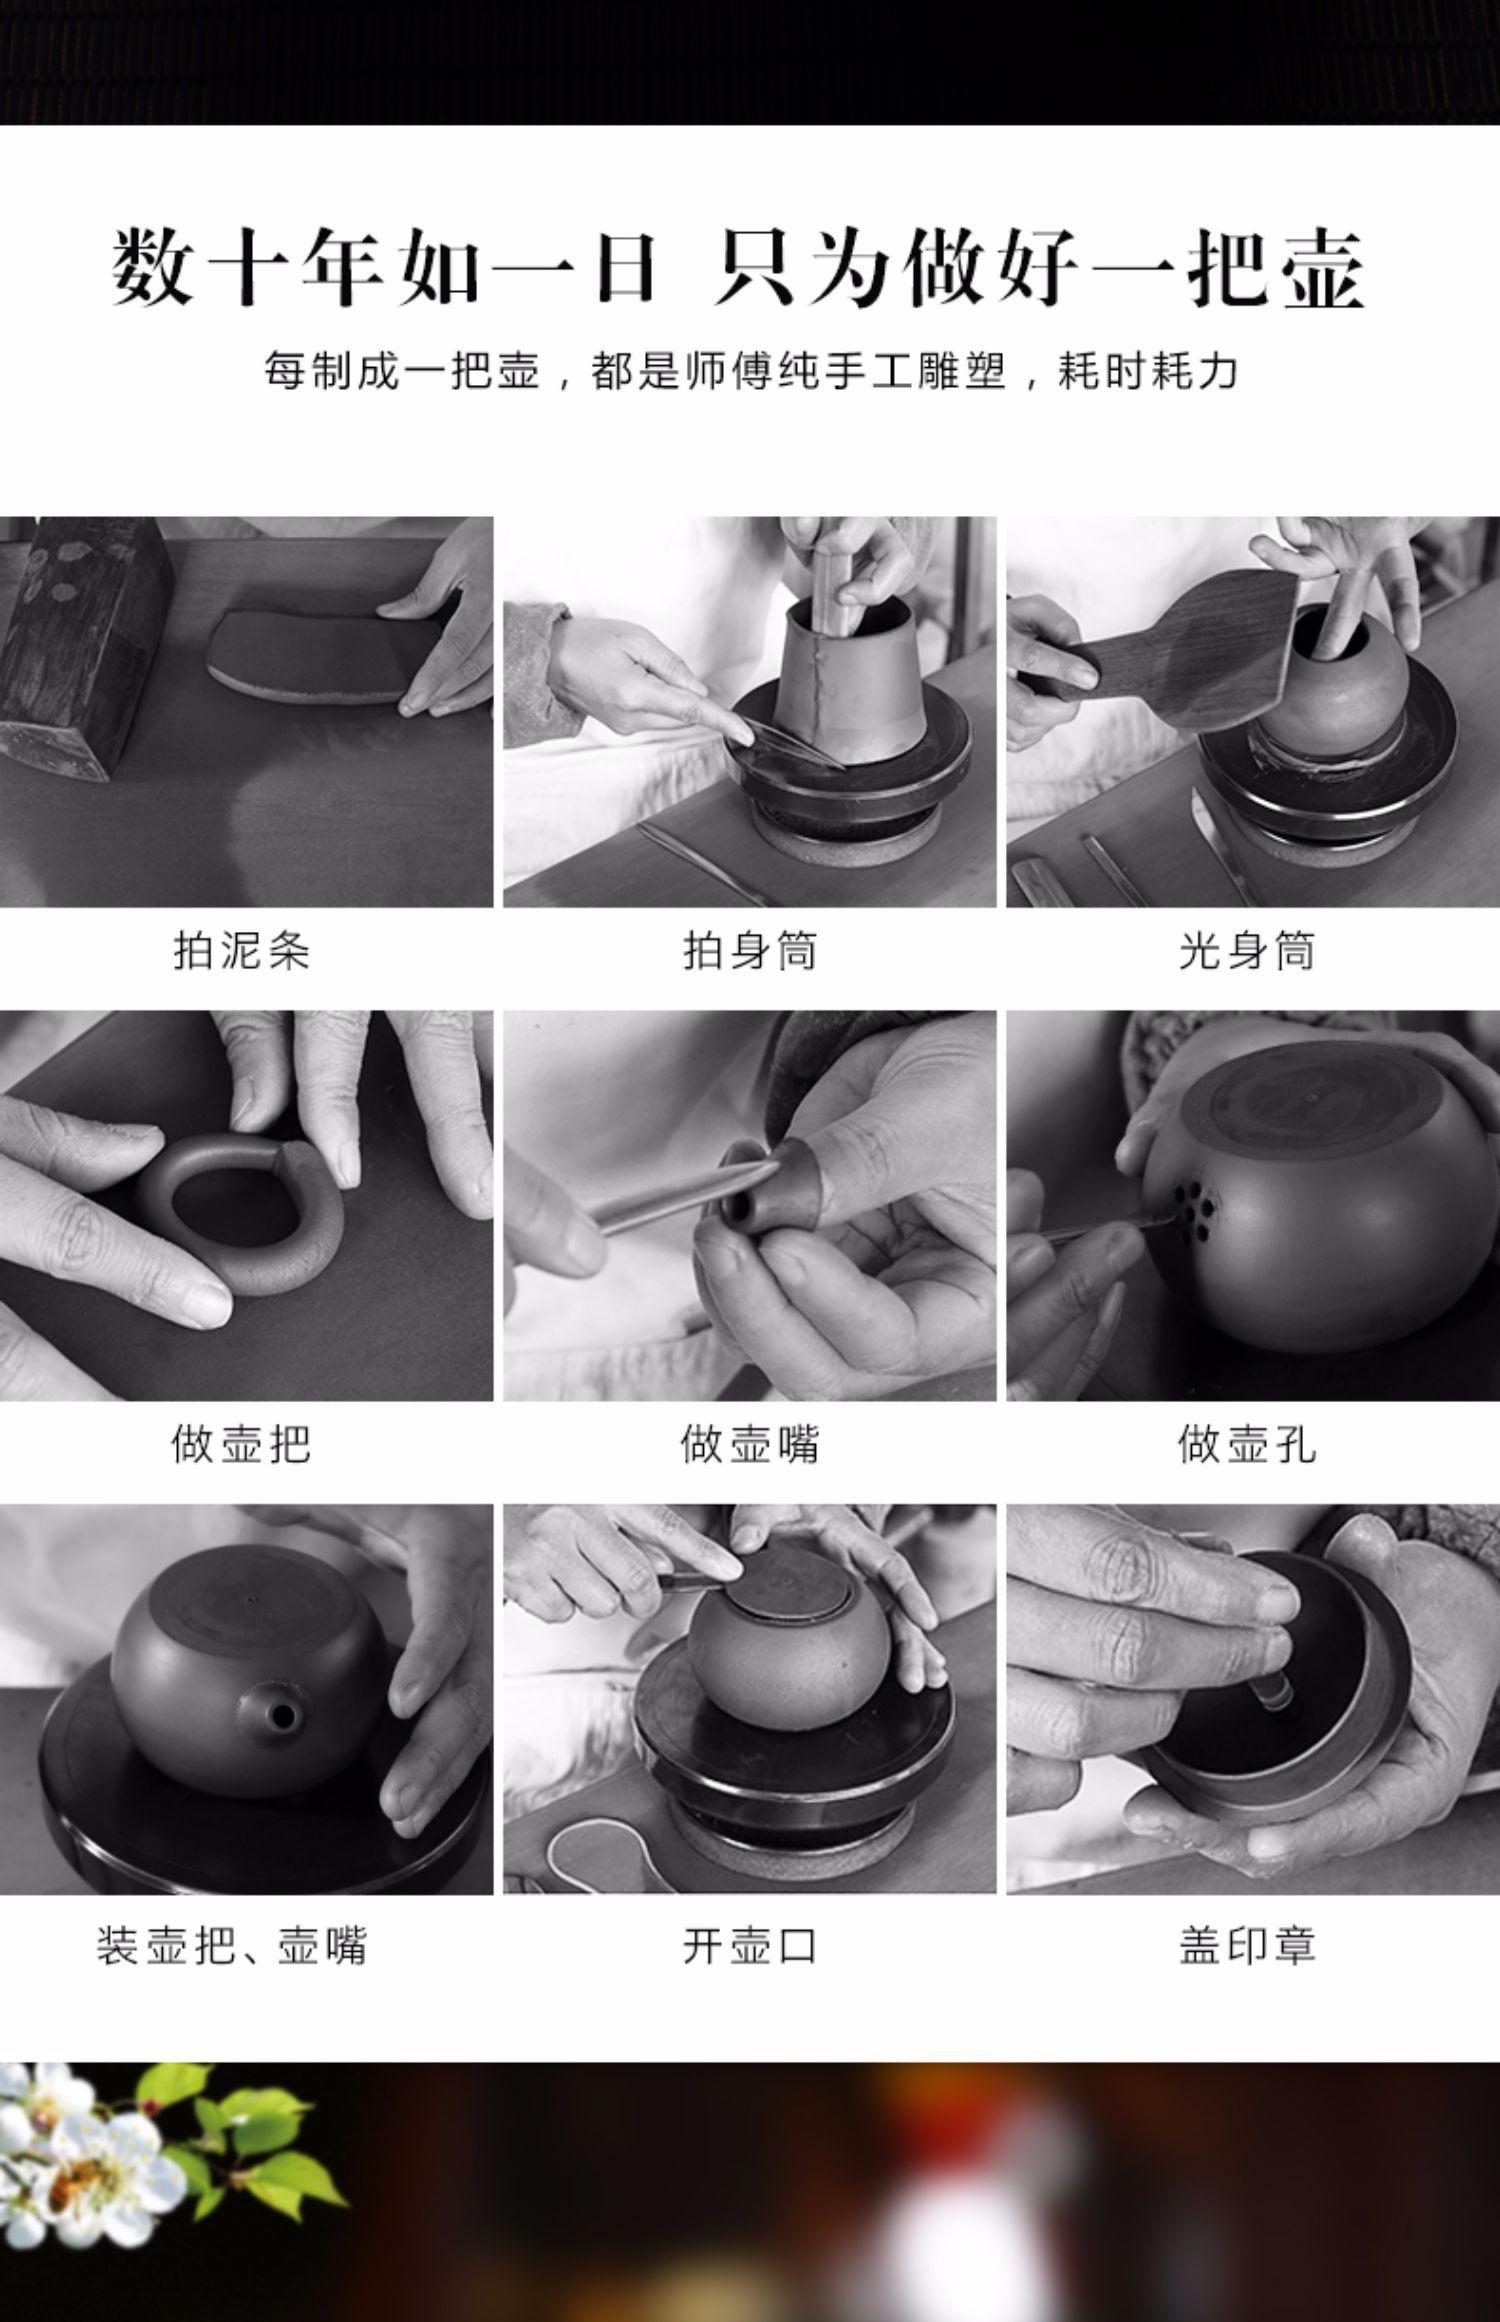 puro artesanal obras de chlorite kung fu